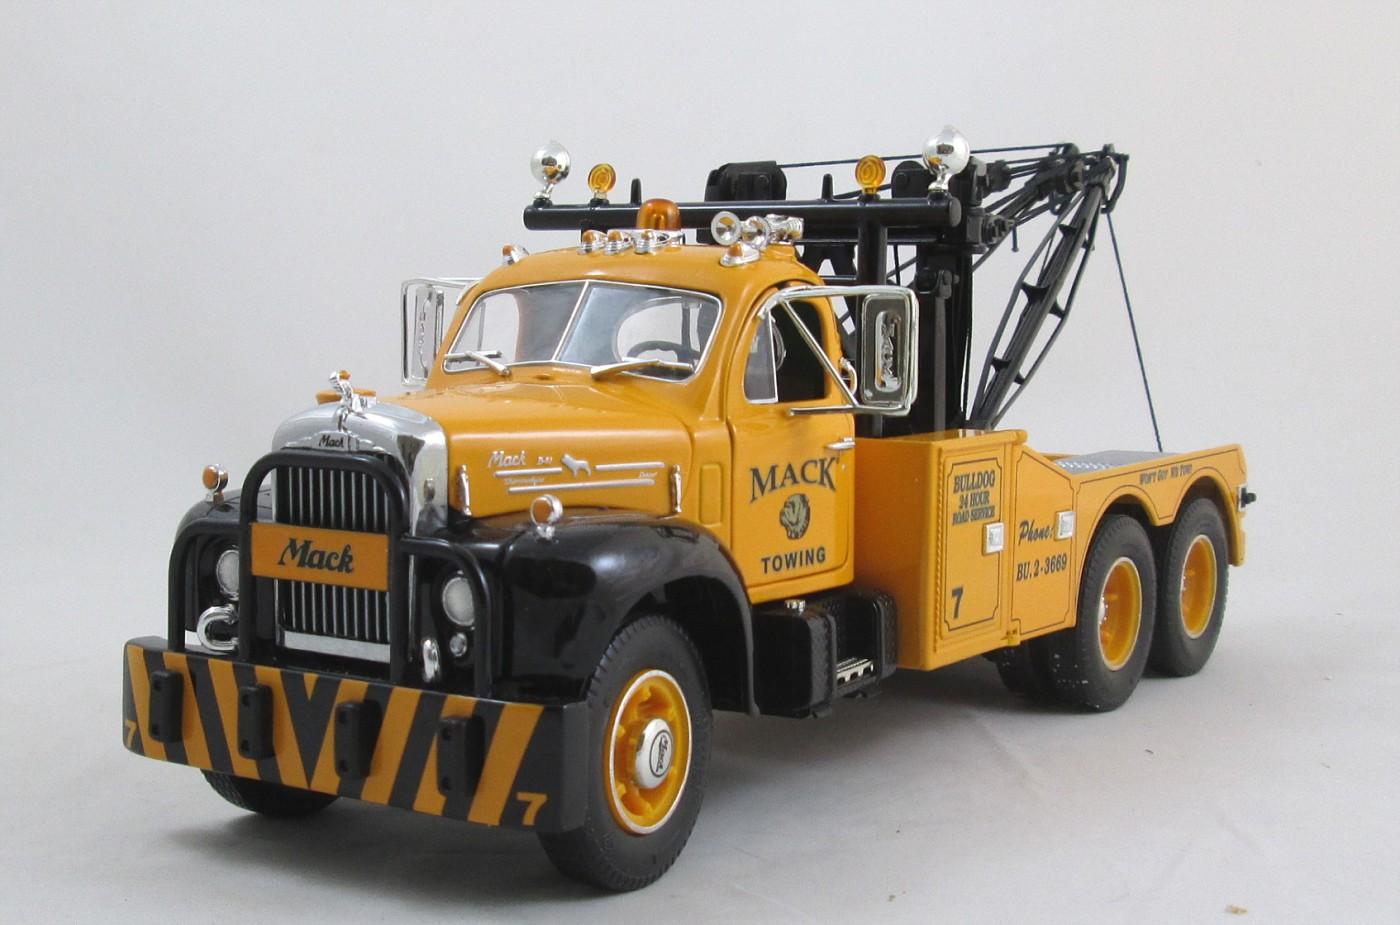 FGR-Mack-Wrecker-49-0003-LF